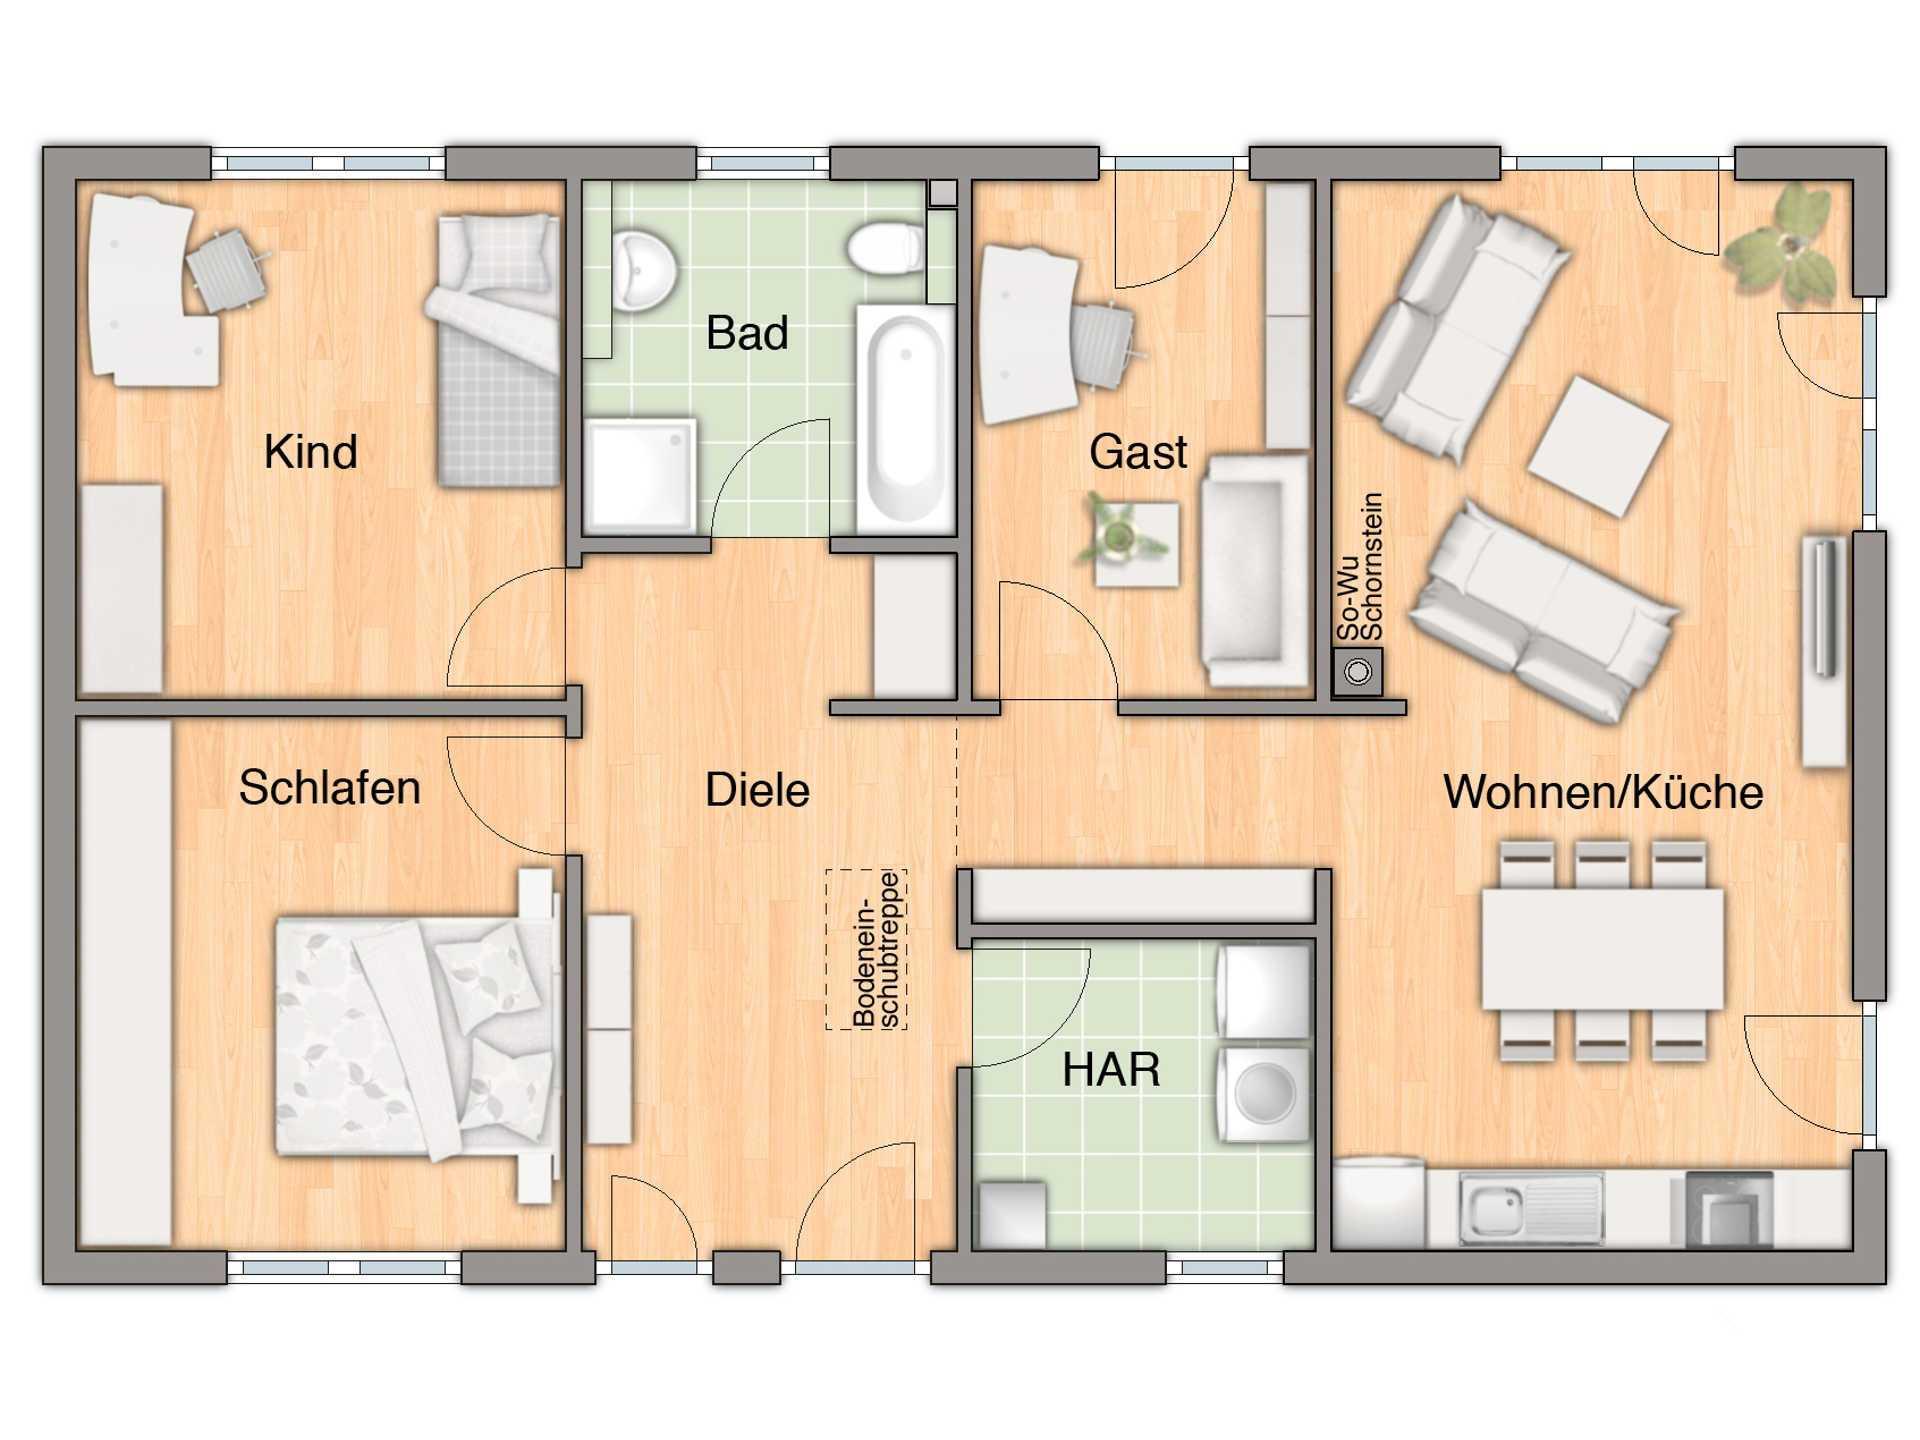 Grundriss bungalow 100 qm  Bungalow 100 - FIMA Hausbau - Town & Country Partner